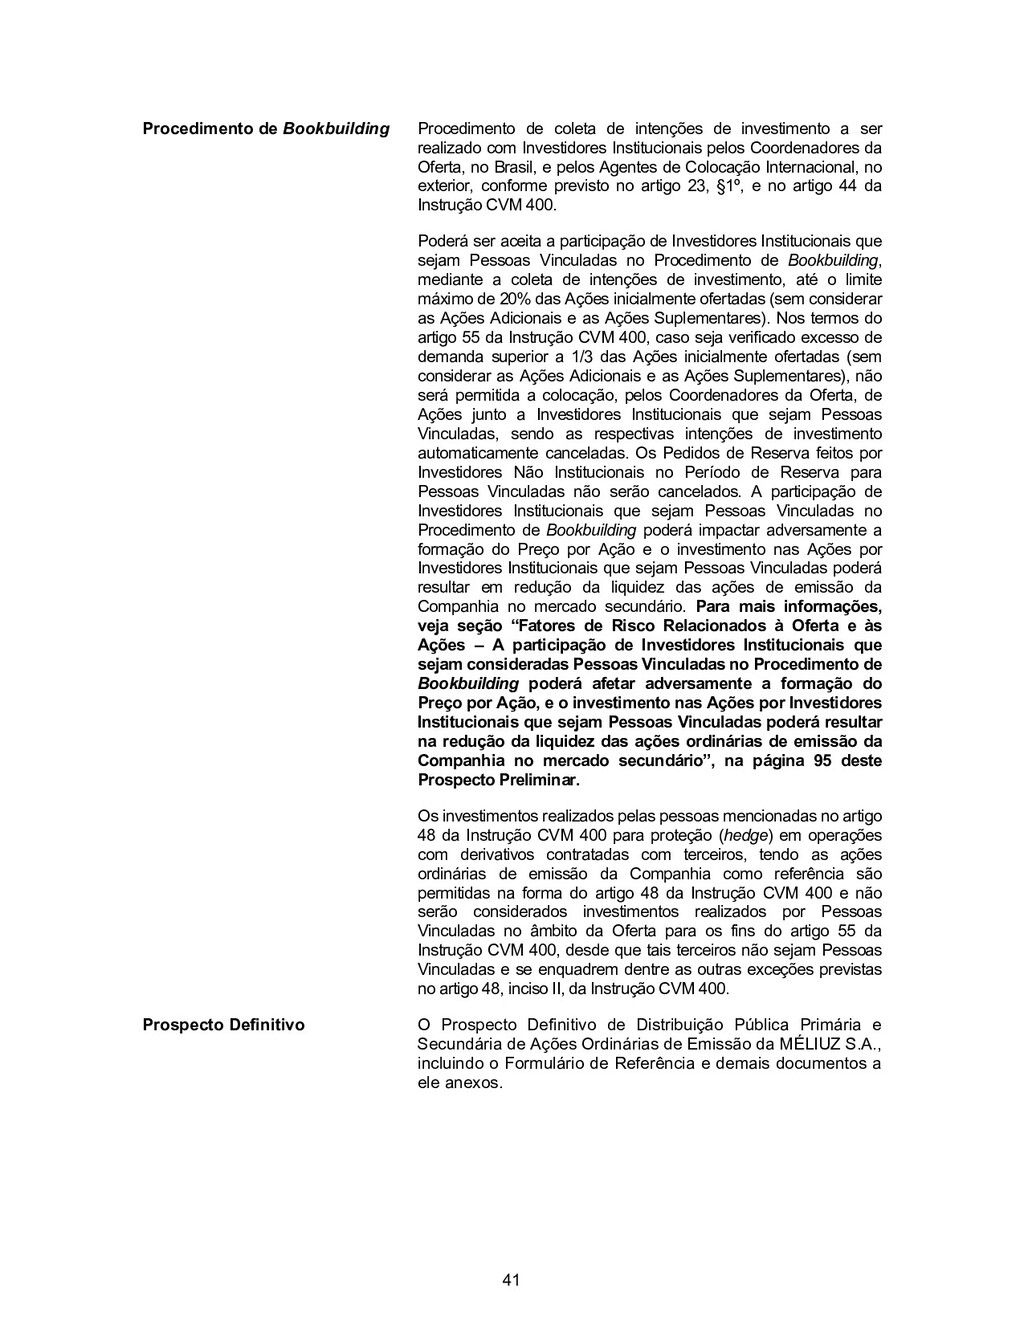 41 Procedimento de Bookbuilding Procedimento de...